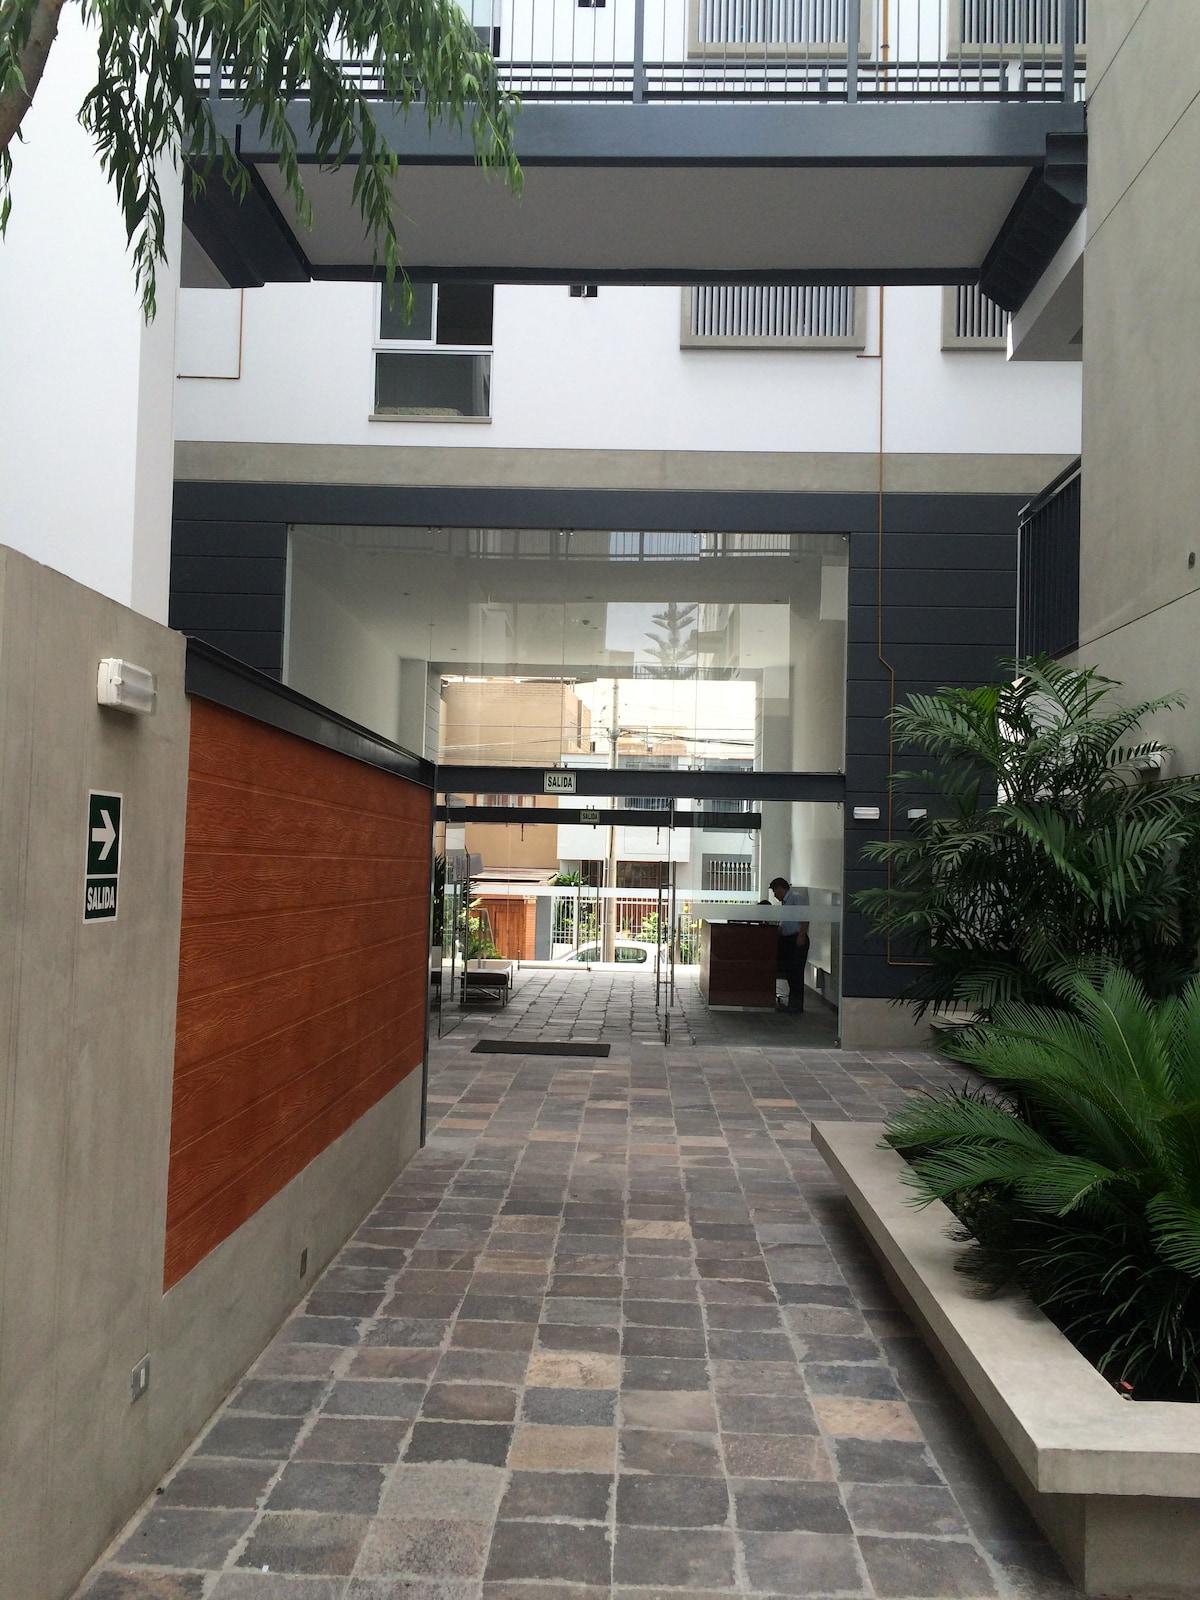 Miraflores: Nice, Clean & New Dorm